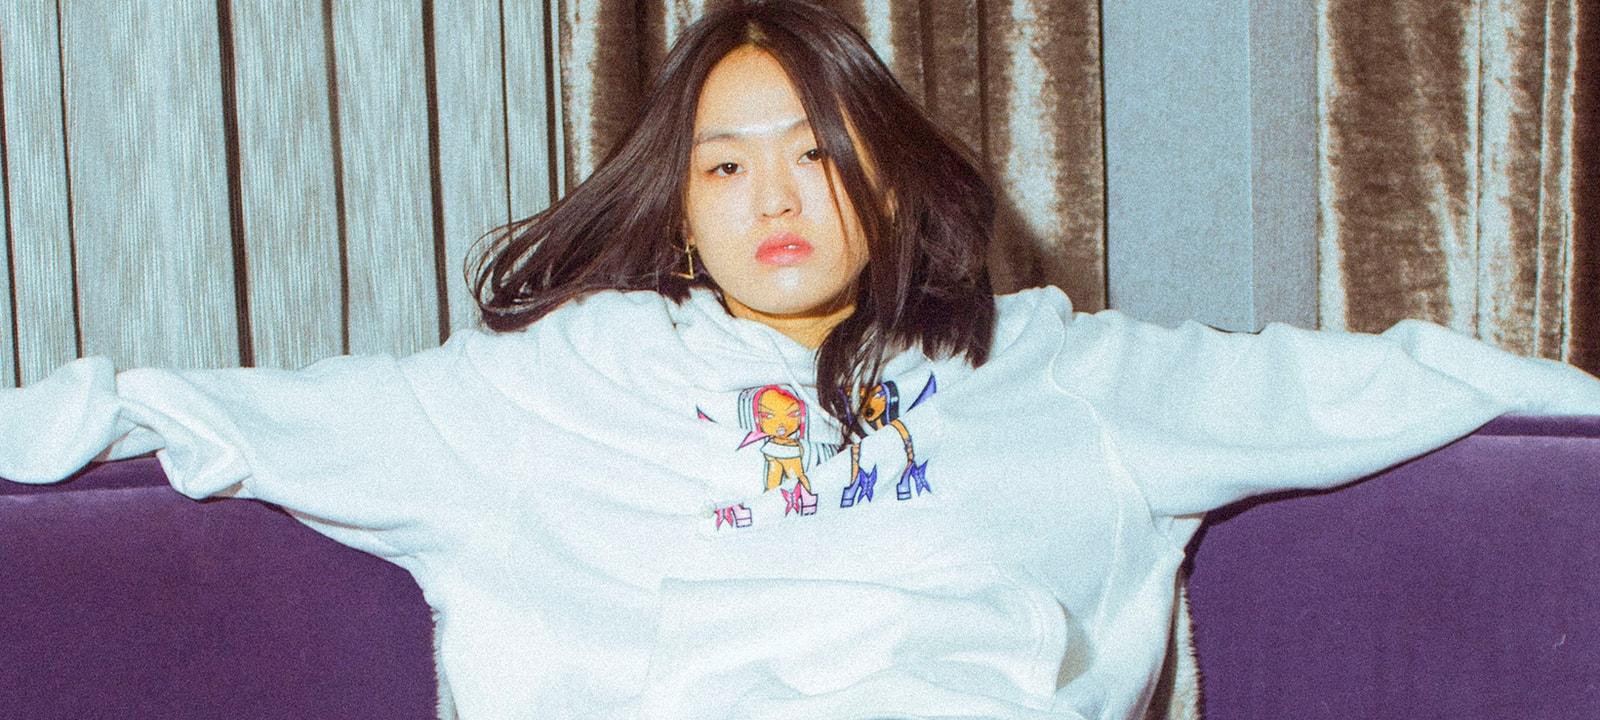 park hye jin south korean dj producer interview Specials Worldwide Art by dasan Left Hand LA